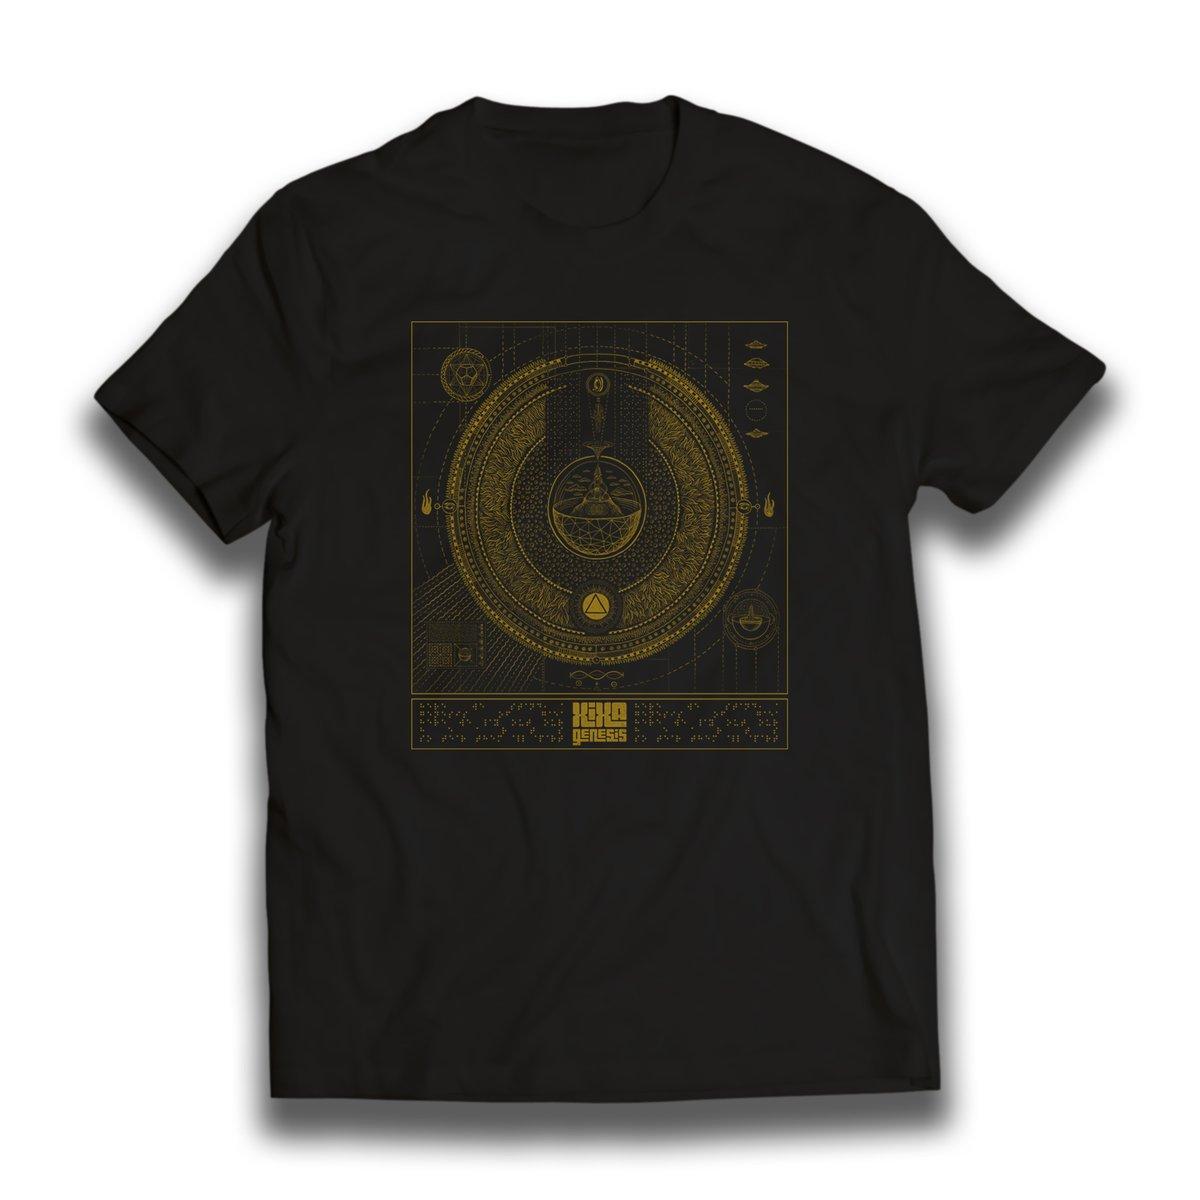 Image of Genesis Shirt